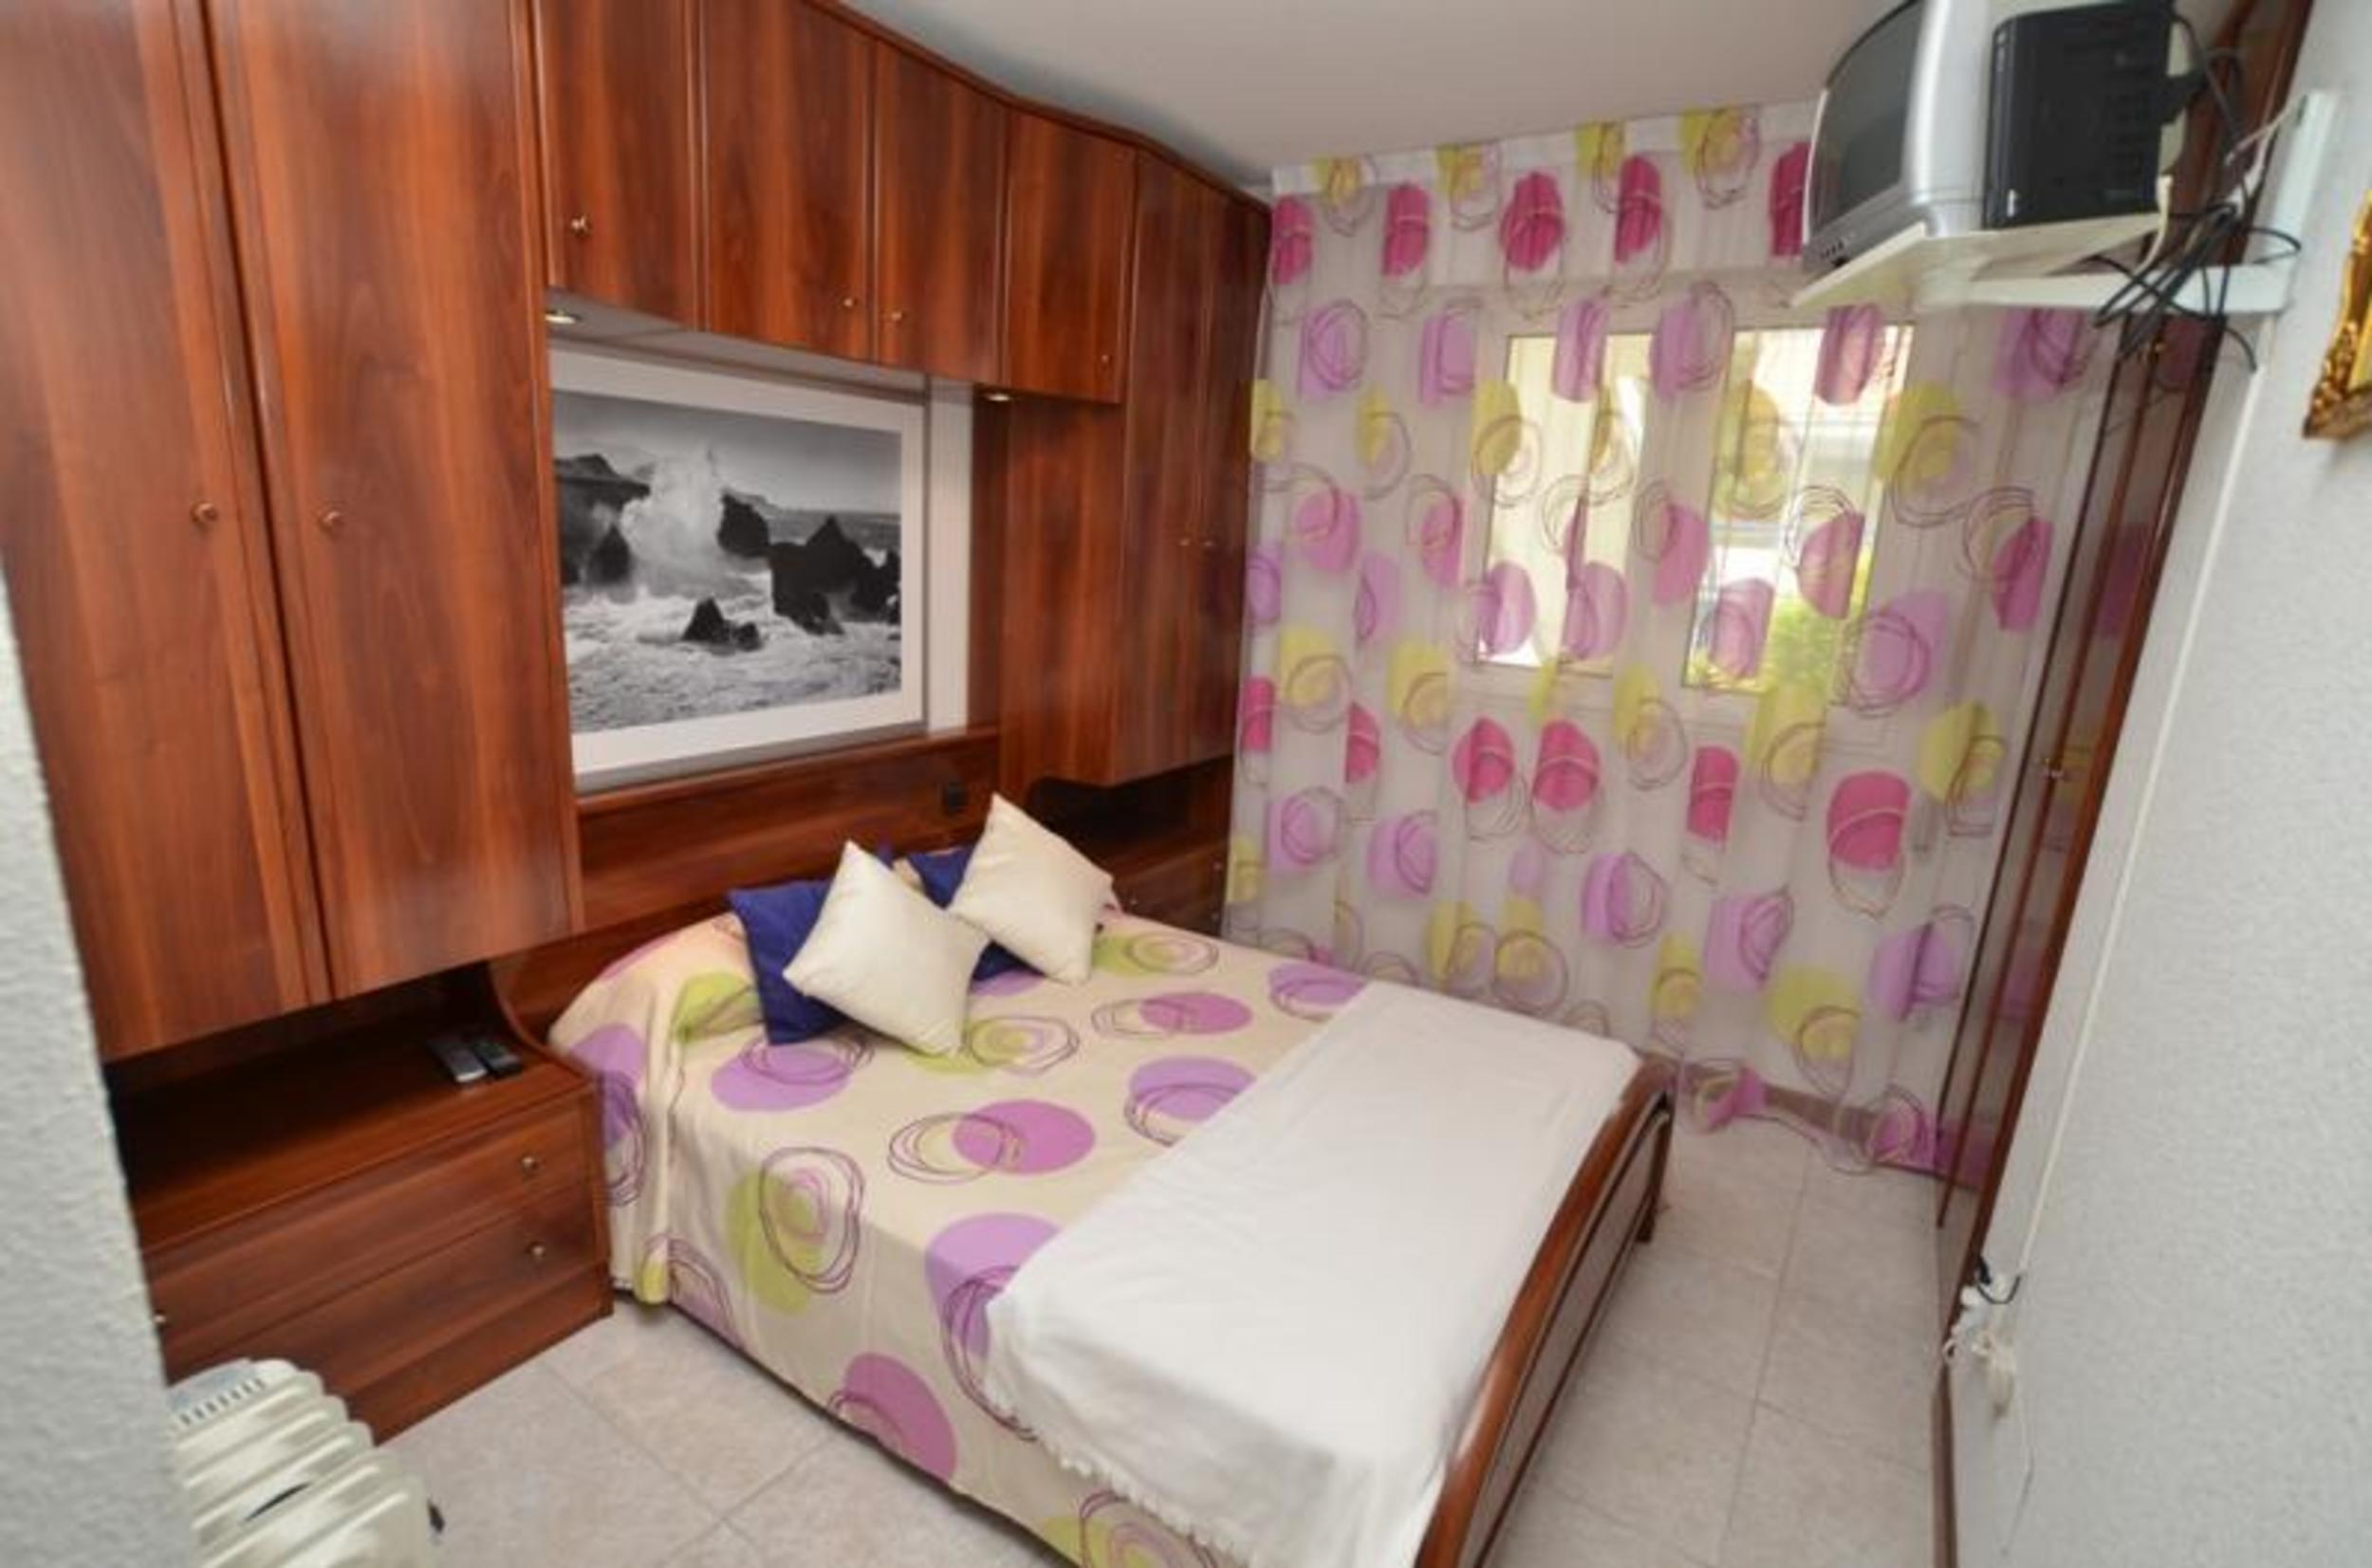 Ferienwohnung Apartment - 2 Bedrooms with Pool and Sea views - 102761 (2360861), Isla, Costa de Cantabria, Kantabrien, Spanien, Bild 9